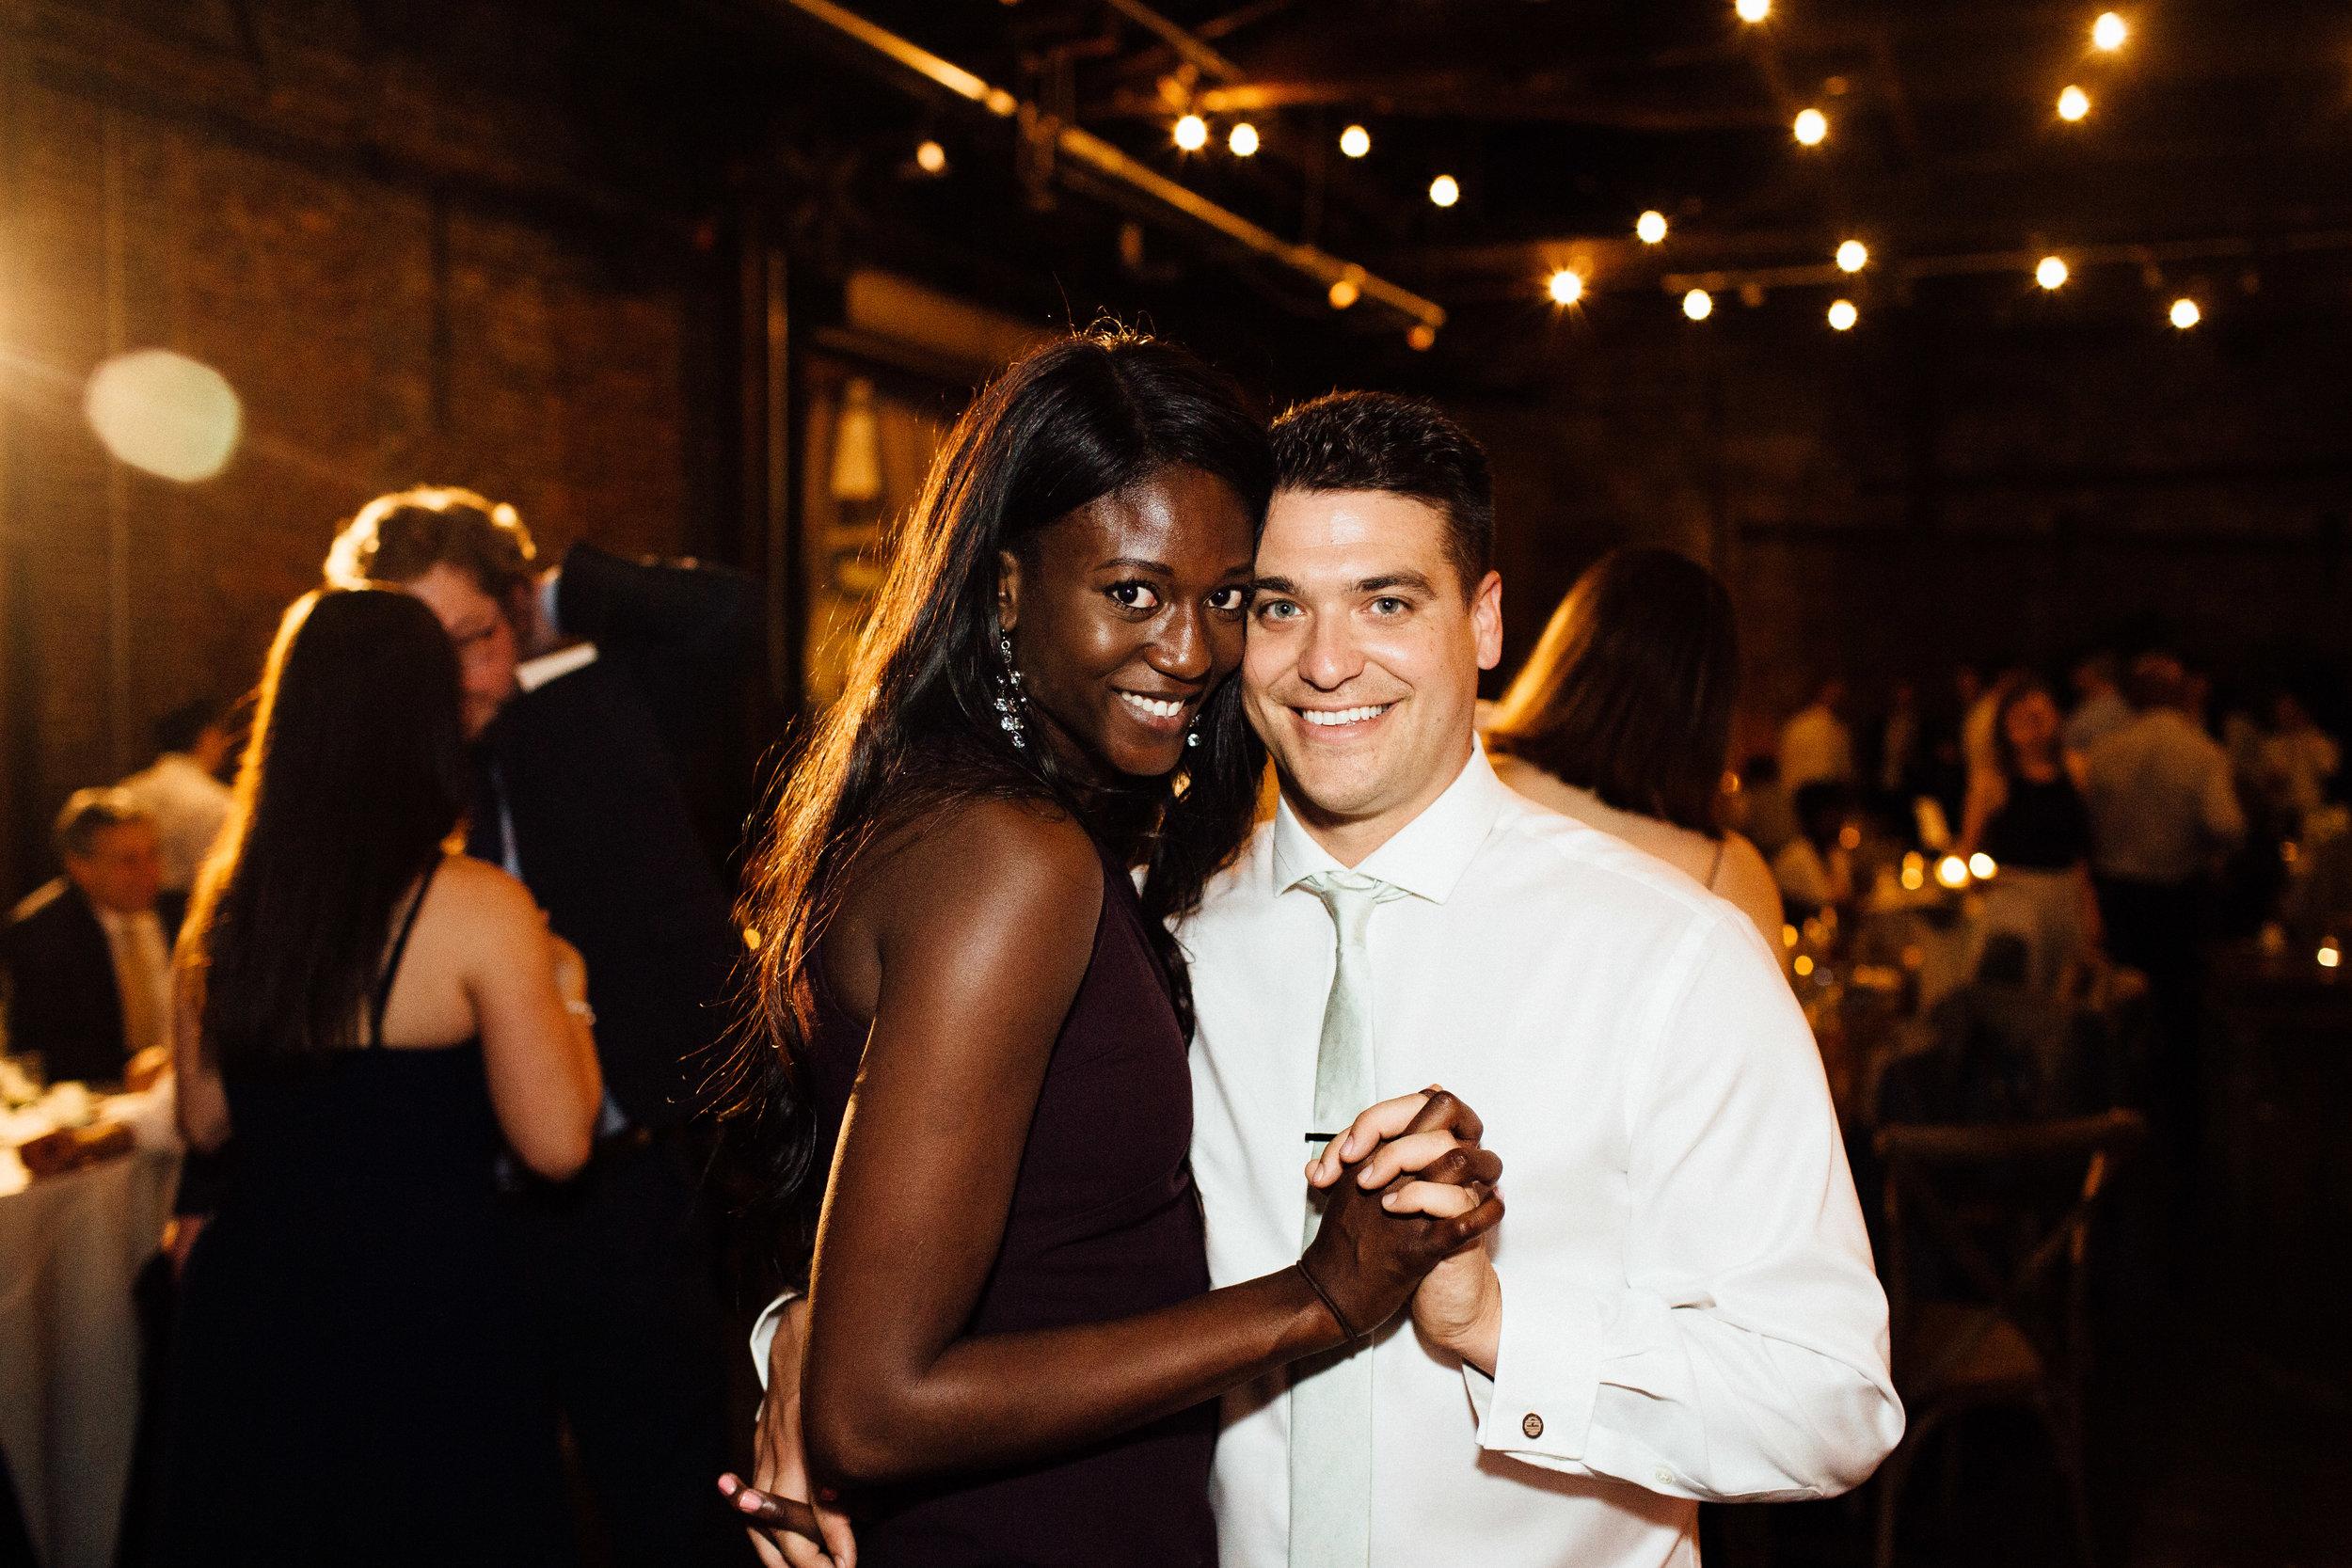 king_plow_atlanta_wedding_art_gallery_modern_lifestyle_documentary_2018.jpg